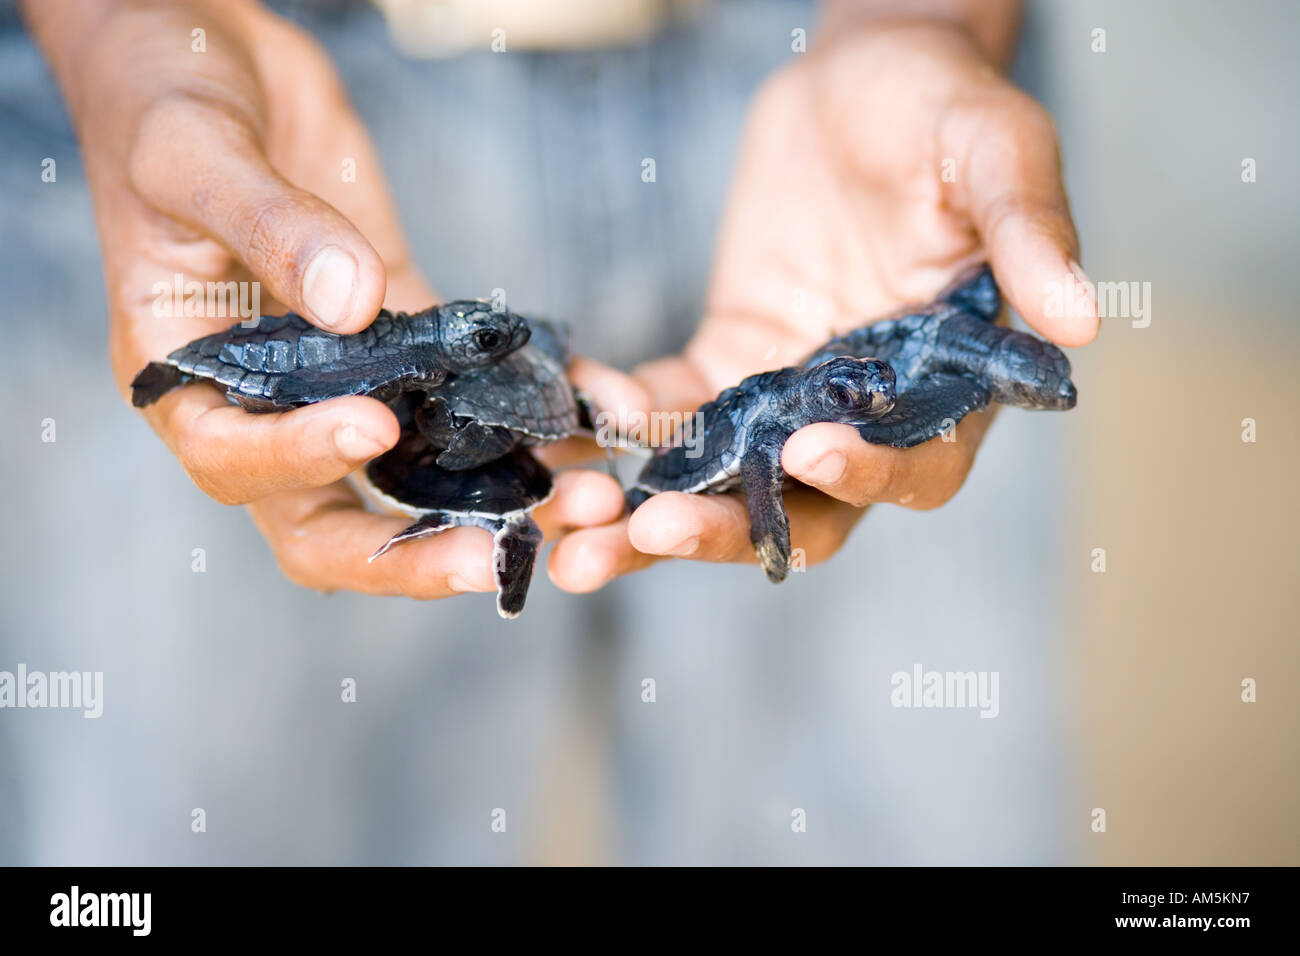 volunteer-holding-baby-sea-turtles-sea-t